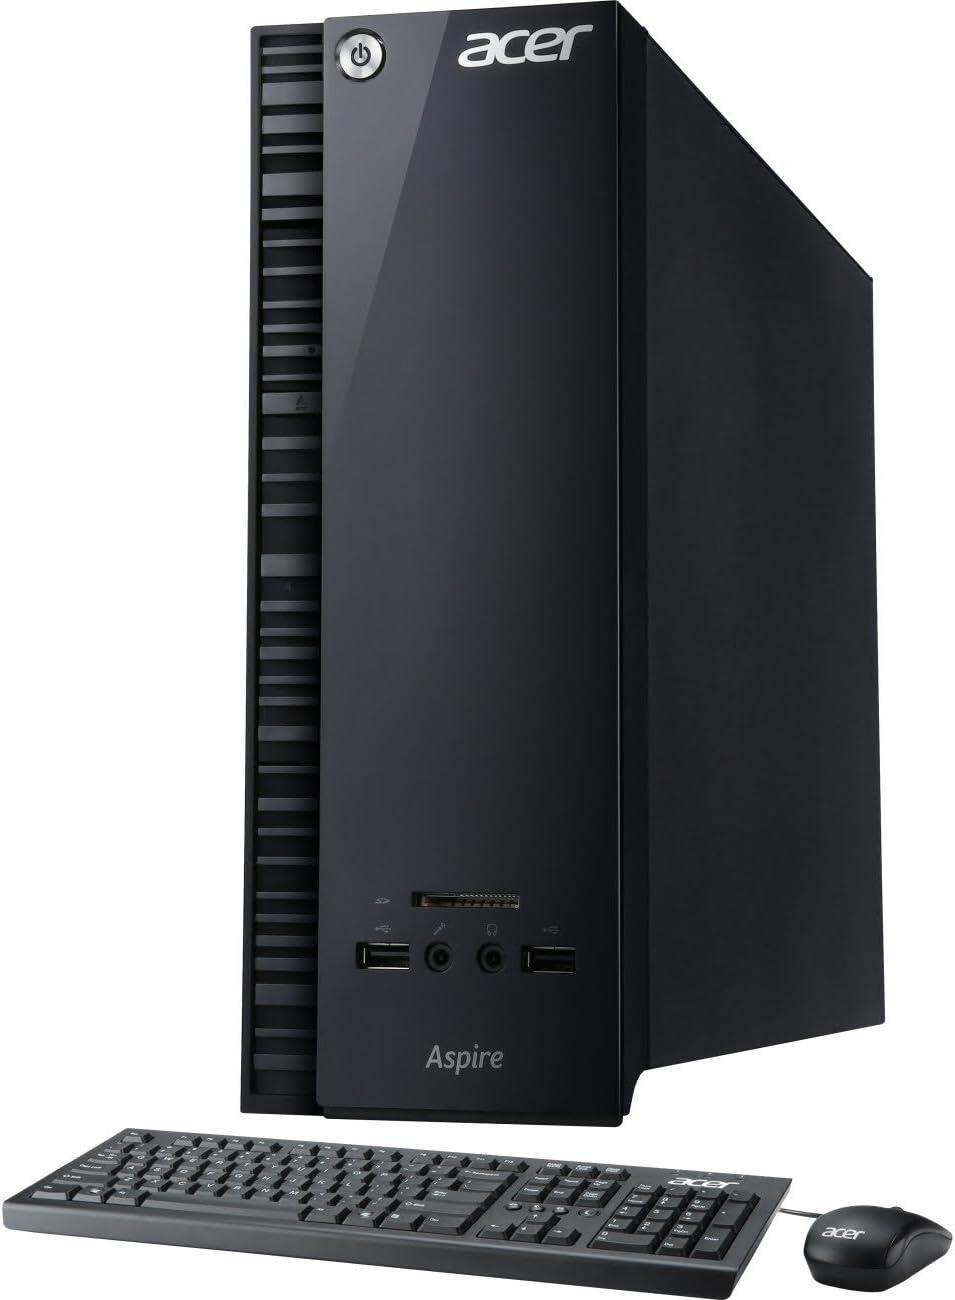 Acer AXC-704G-UW61 Desktop PC Celeron 1.60GHz CPU 4GB RAM 500GB HDD Windows 10